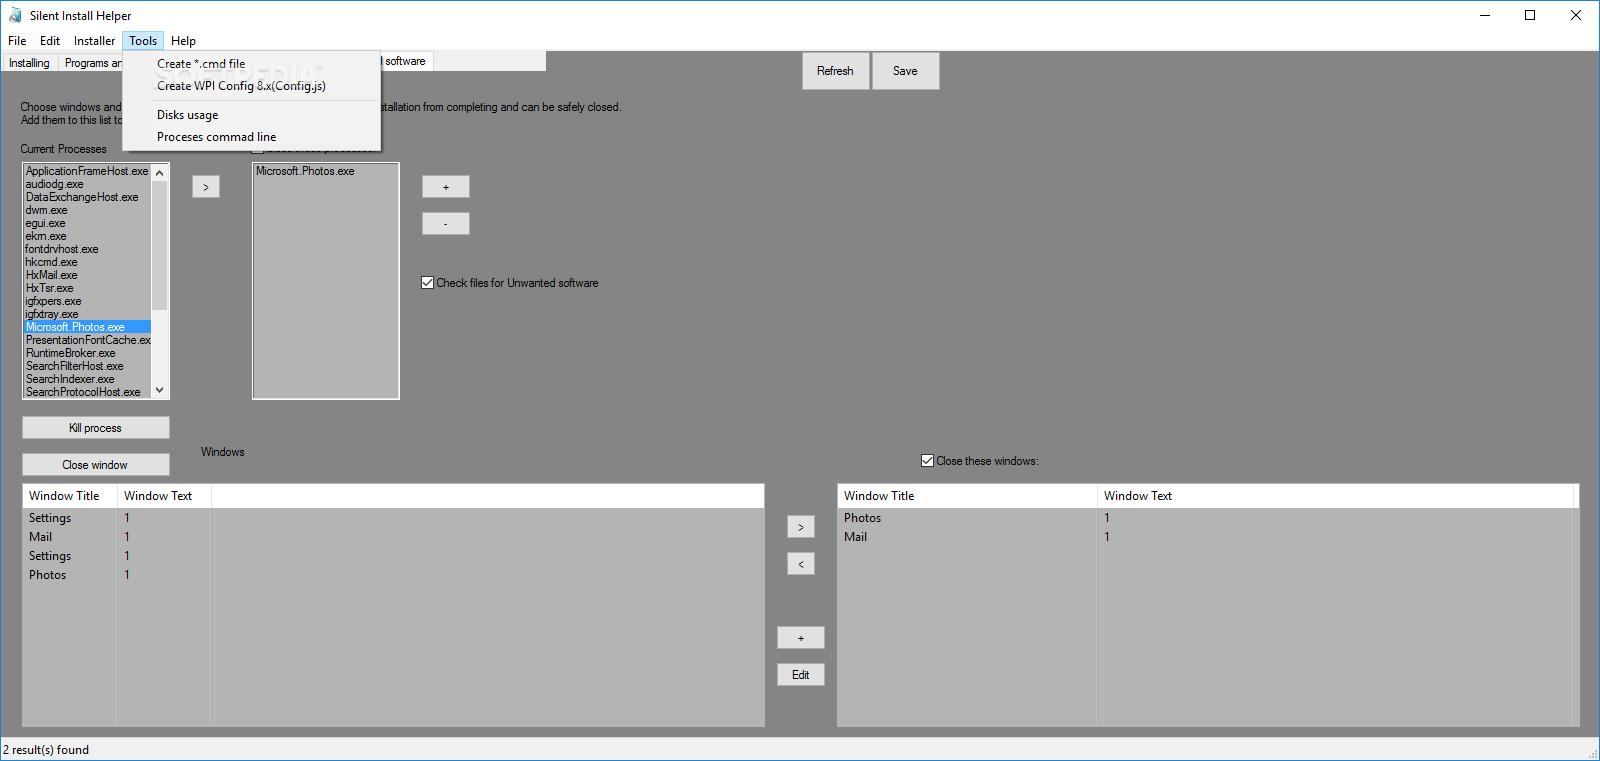 Download Silent Install Helper 3 6 0 0